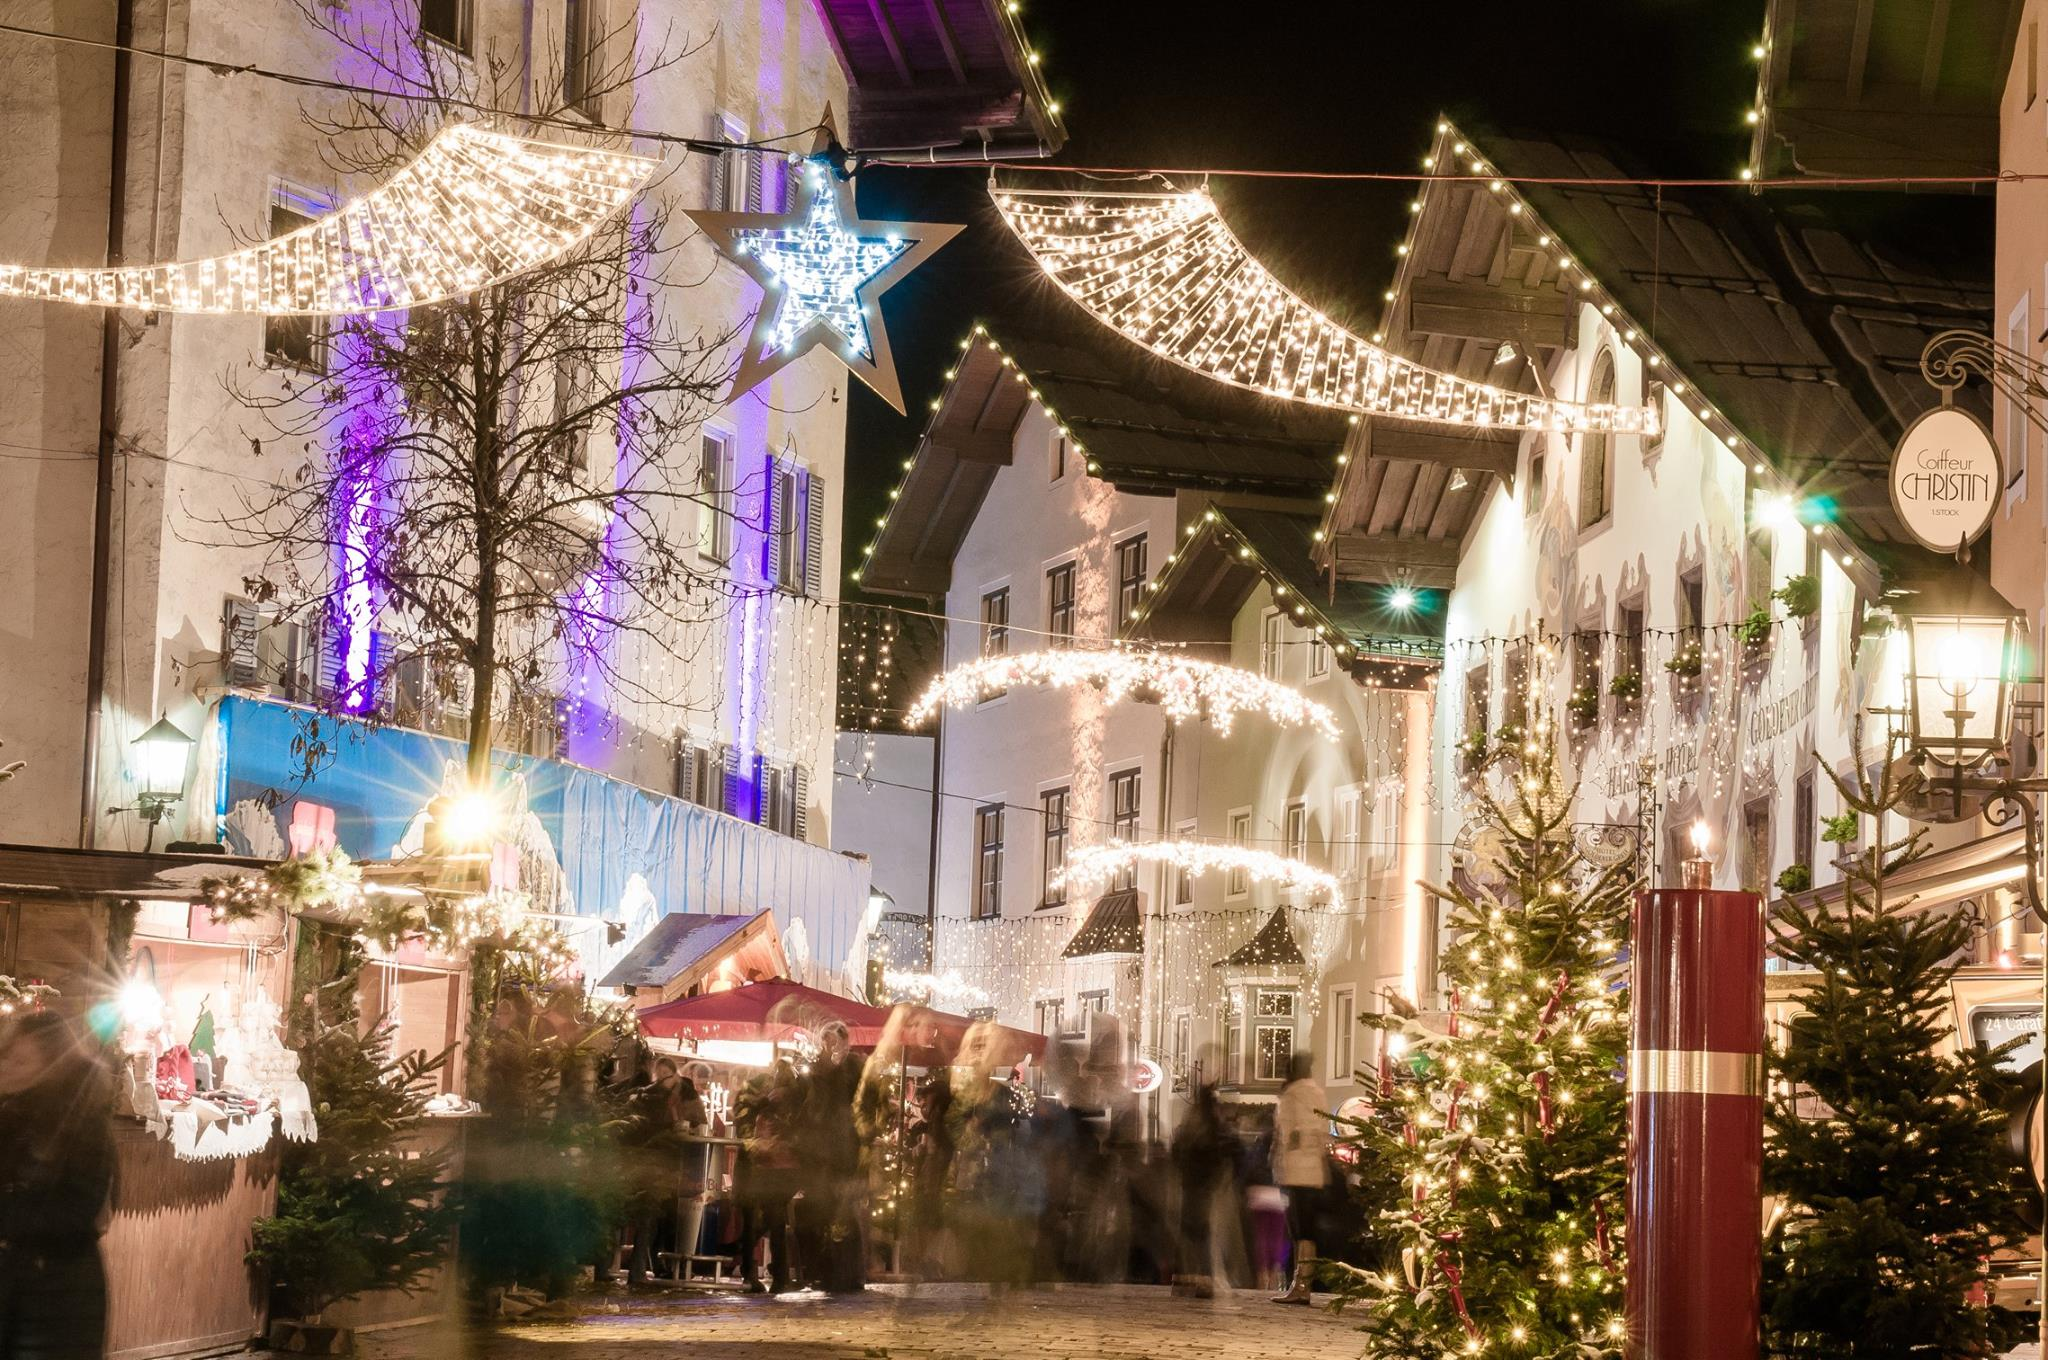 kitzbuehel christmas market - Christmas Mountain Resort